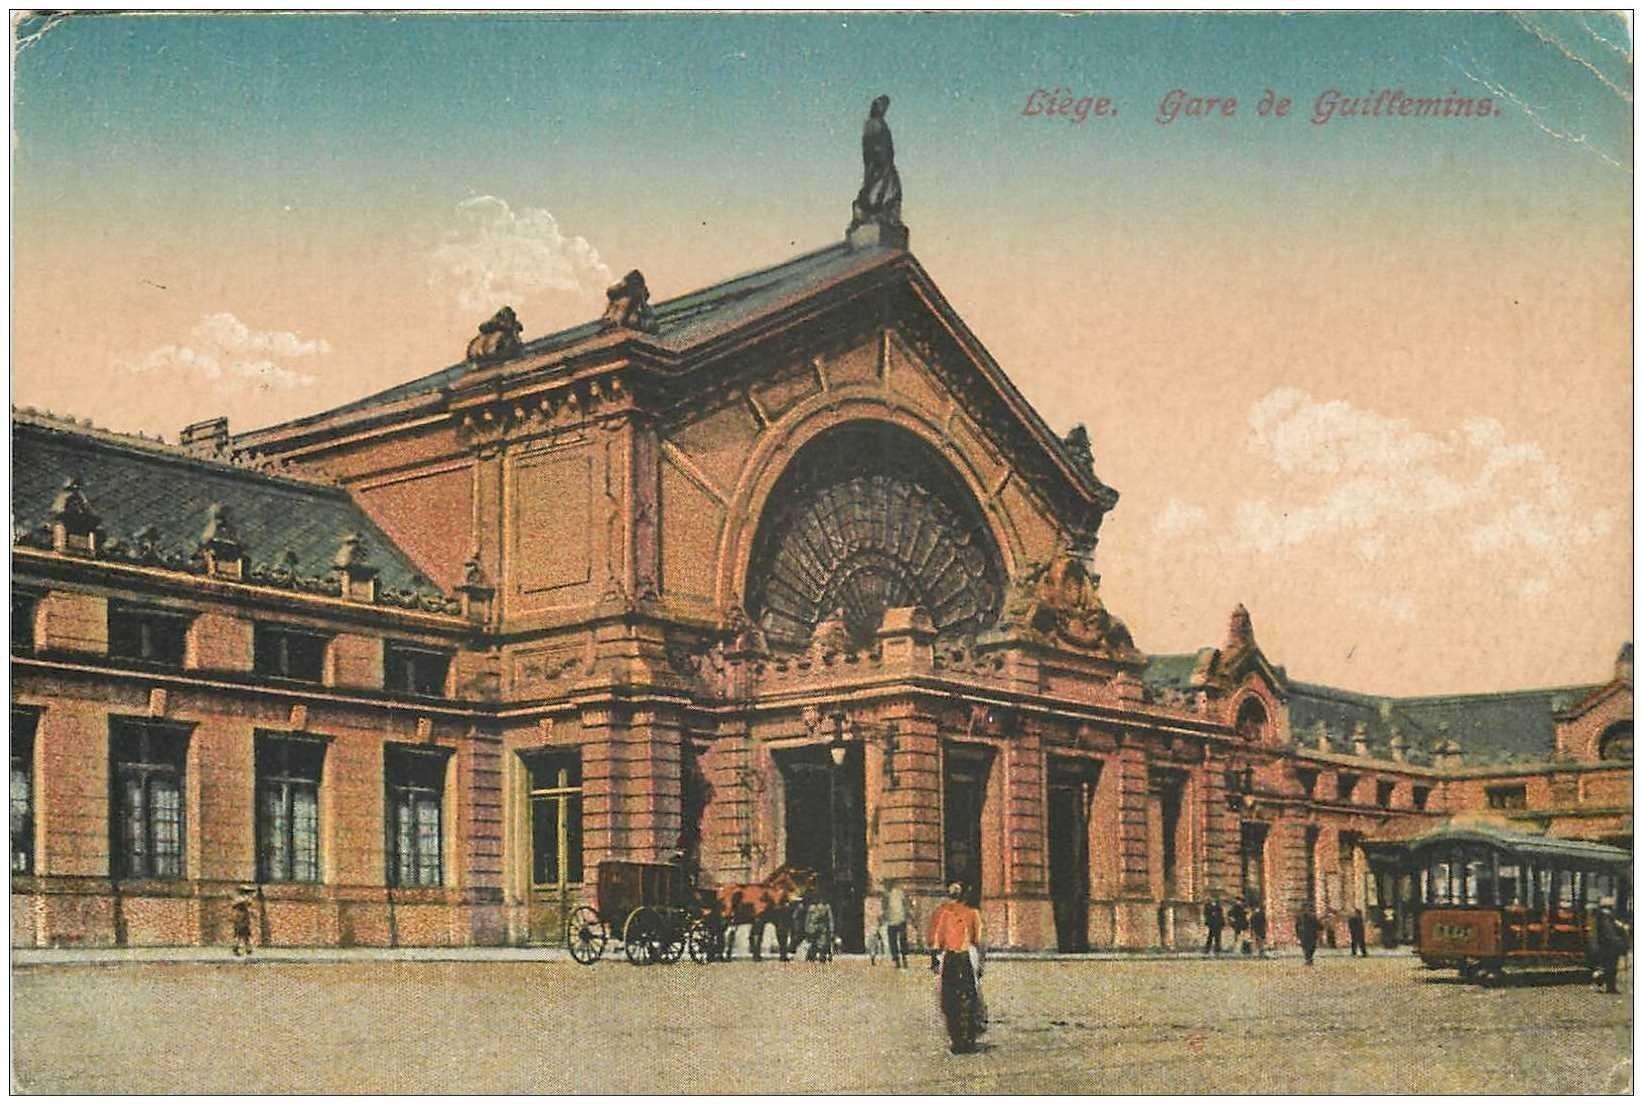 carte postale ancienne LIEGE. Gare de Guillemins 1922 ridules coin...